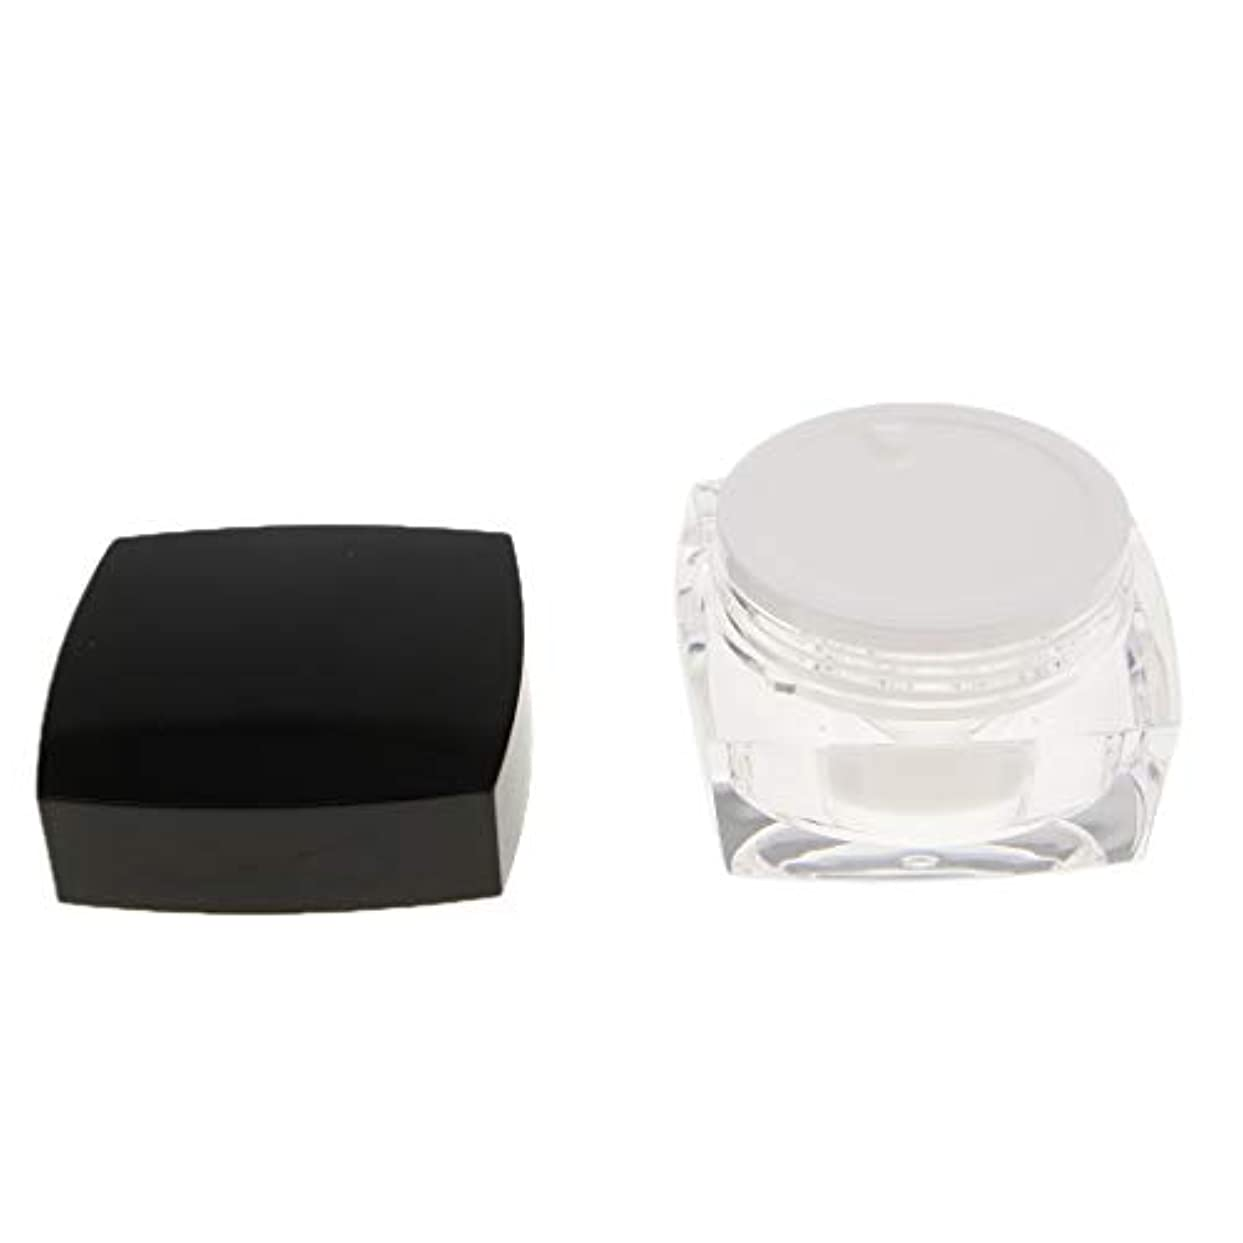 B Baosity 化粧品容器 クリームジャー 旅行小物 コスメ 詰替え 2サイズ選べ - 50g